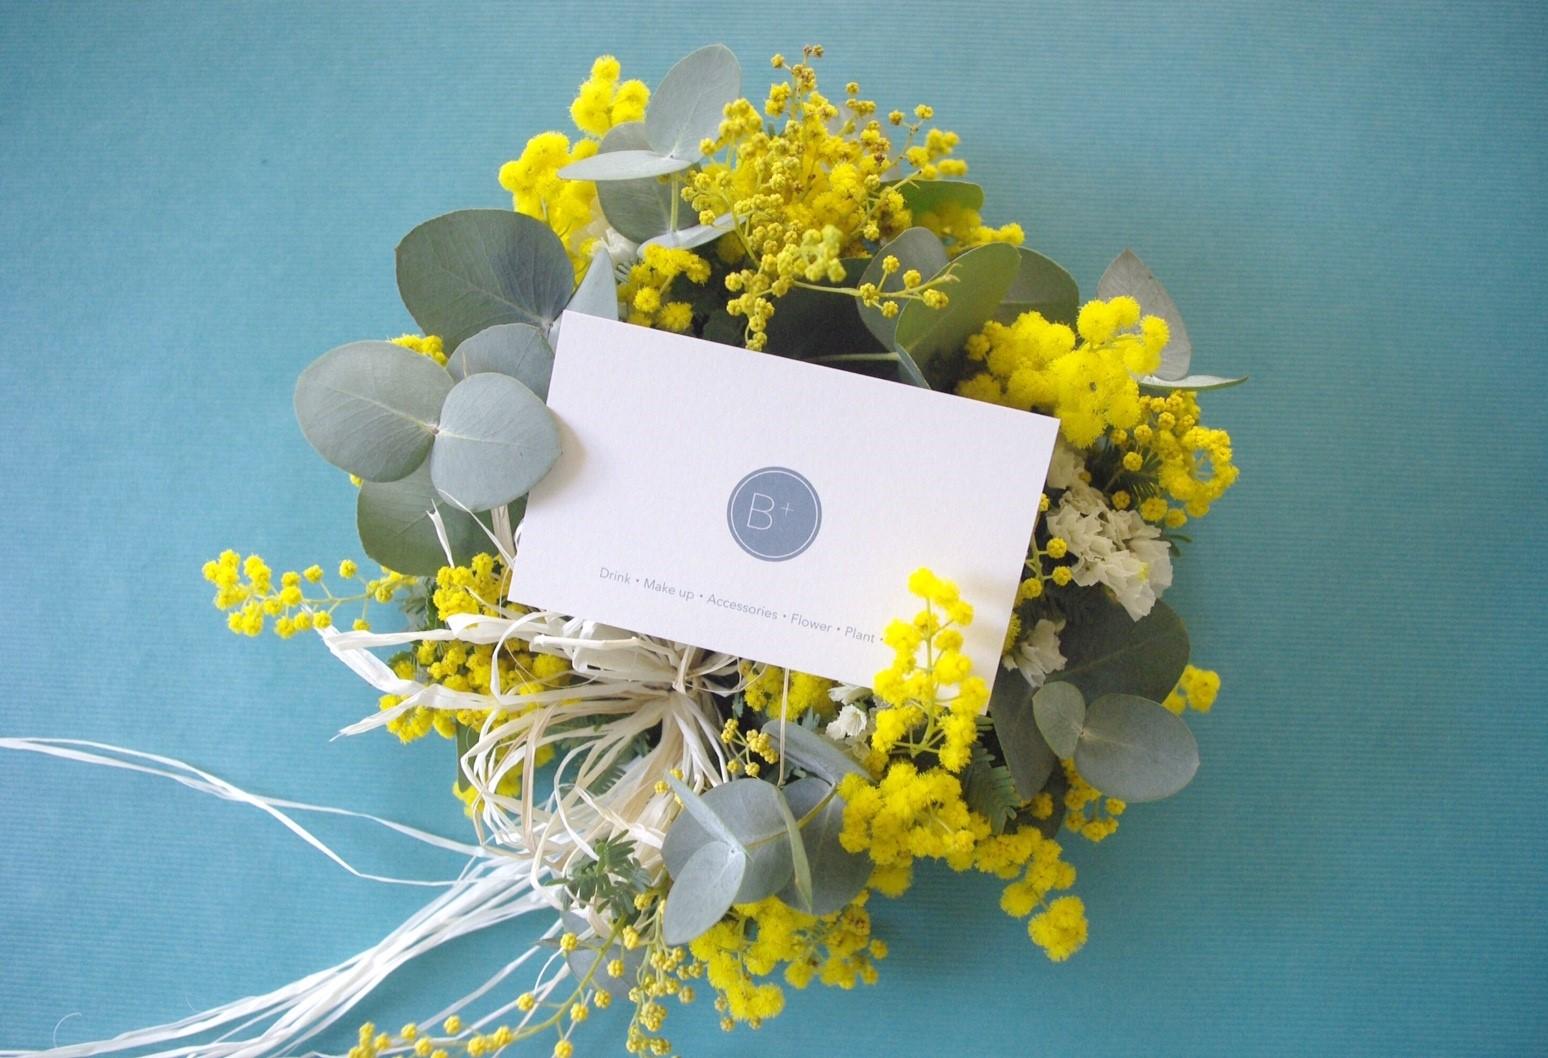 2018.3.4(sun) Flower Work Shop